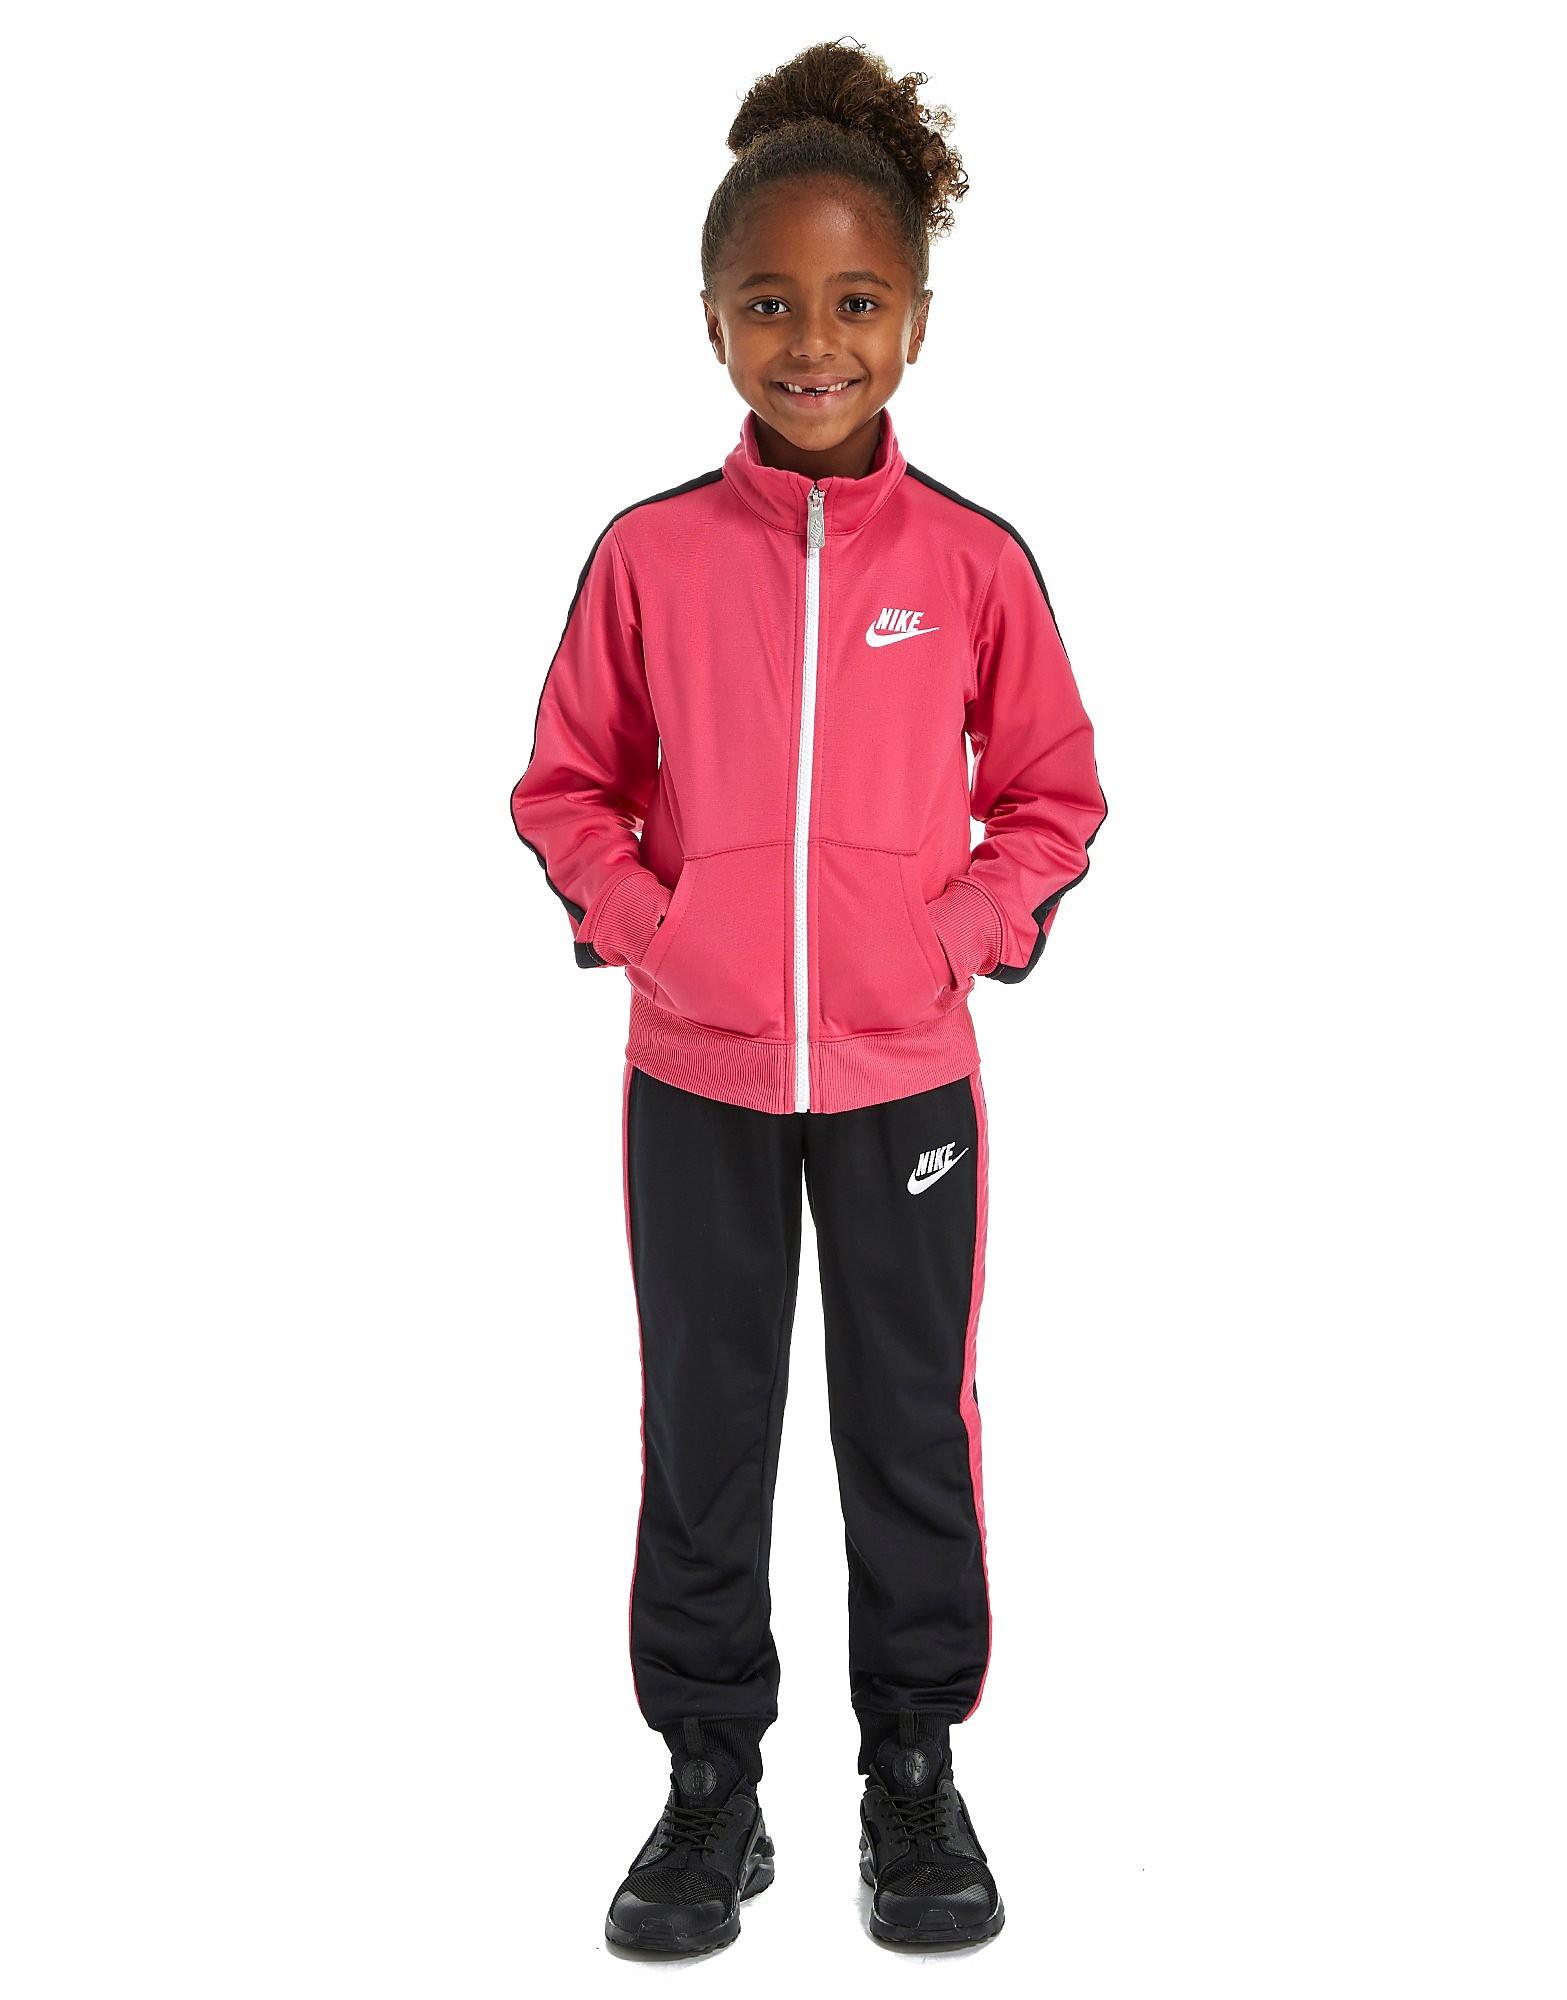 Nike Girls' Tricot Tracksuit Children